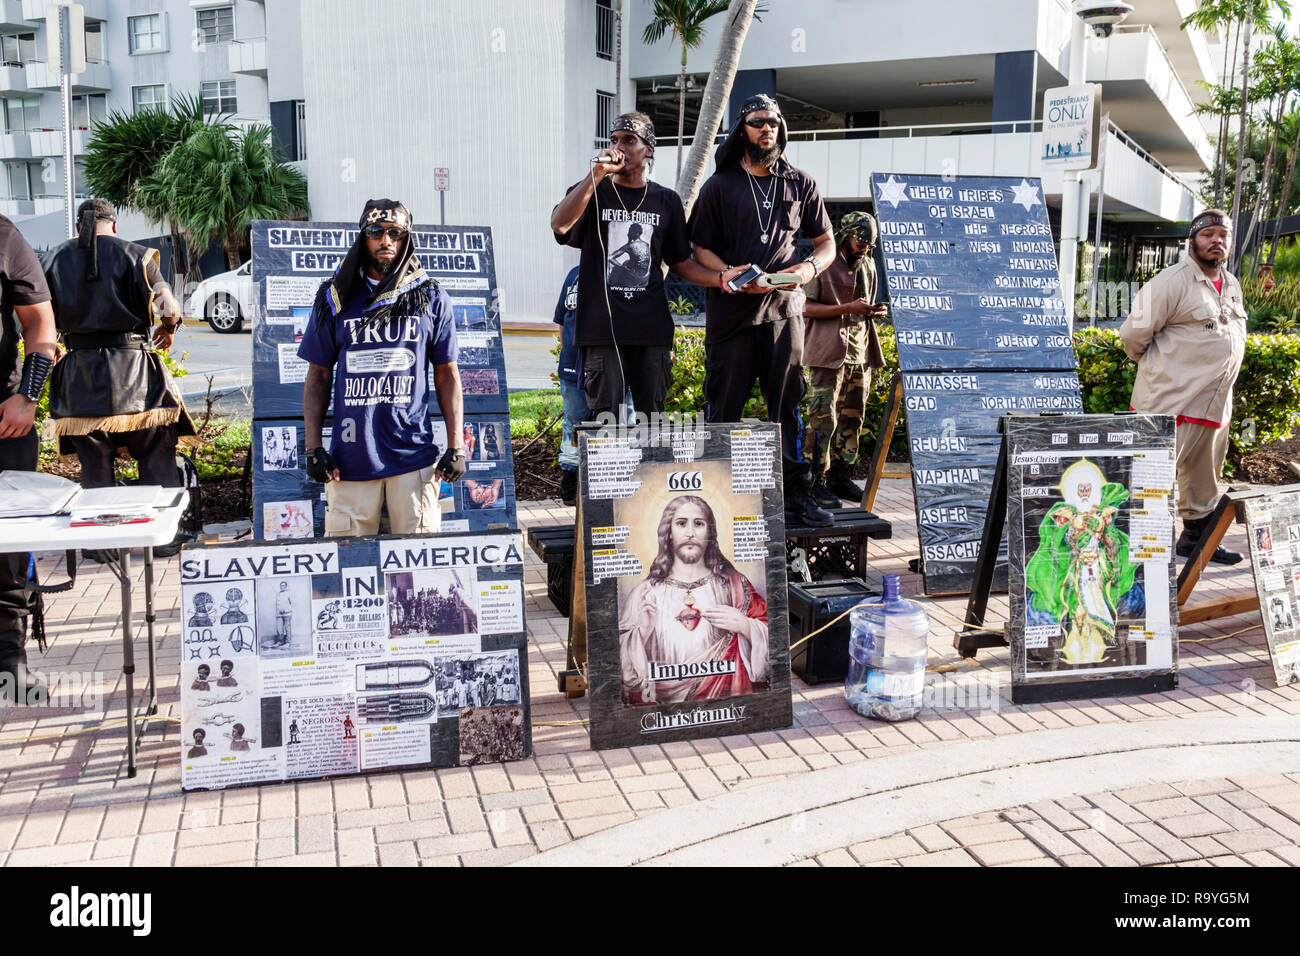 Miami Beach Florida Lummus Park free speech speaking speaker ISPUK Israelite School of Universal Practical Knowledge Black man signs Stock Photo